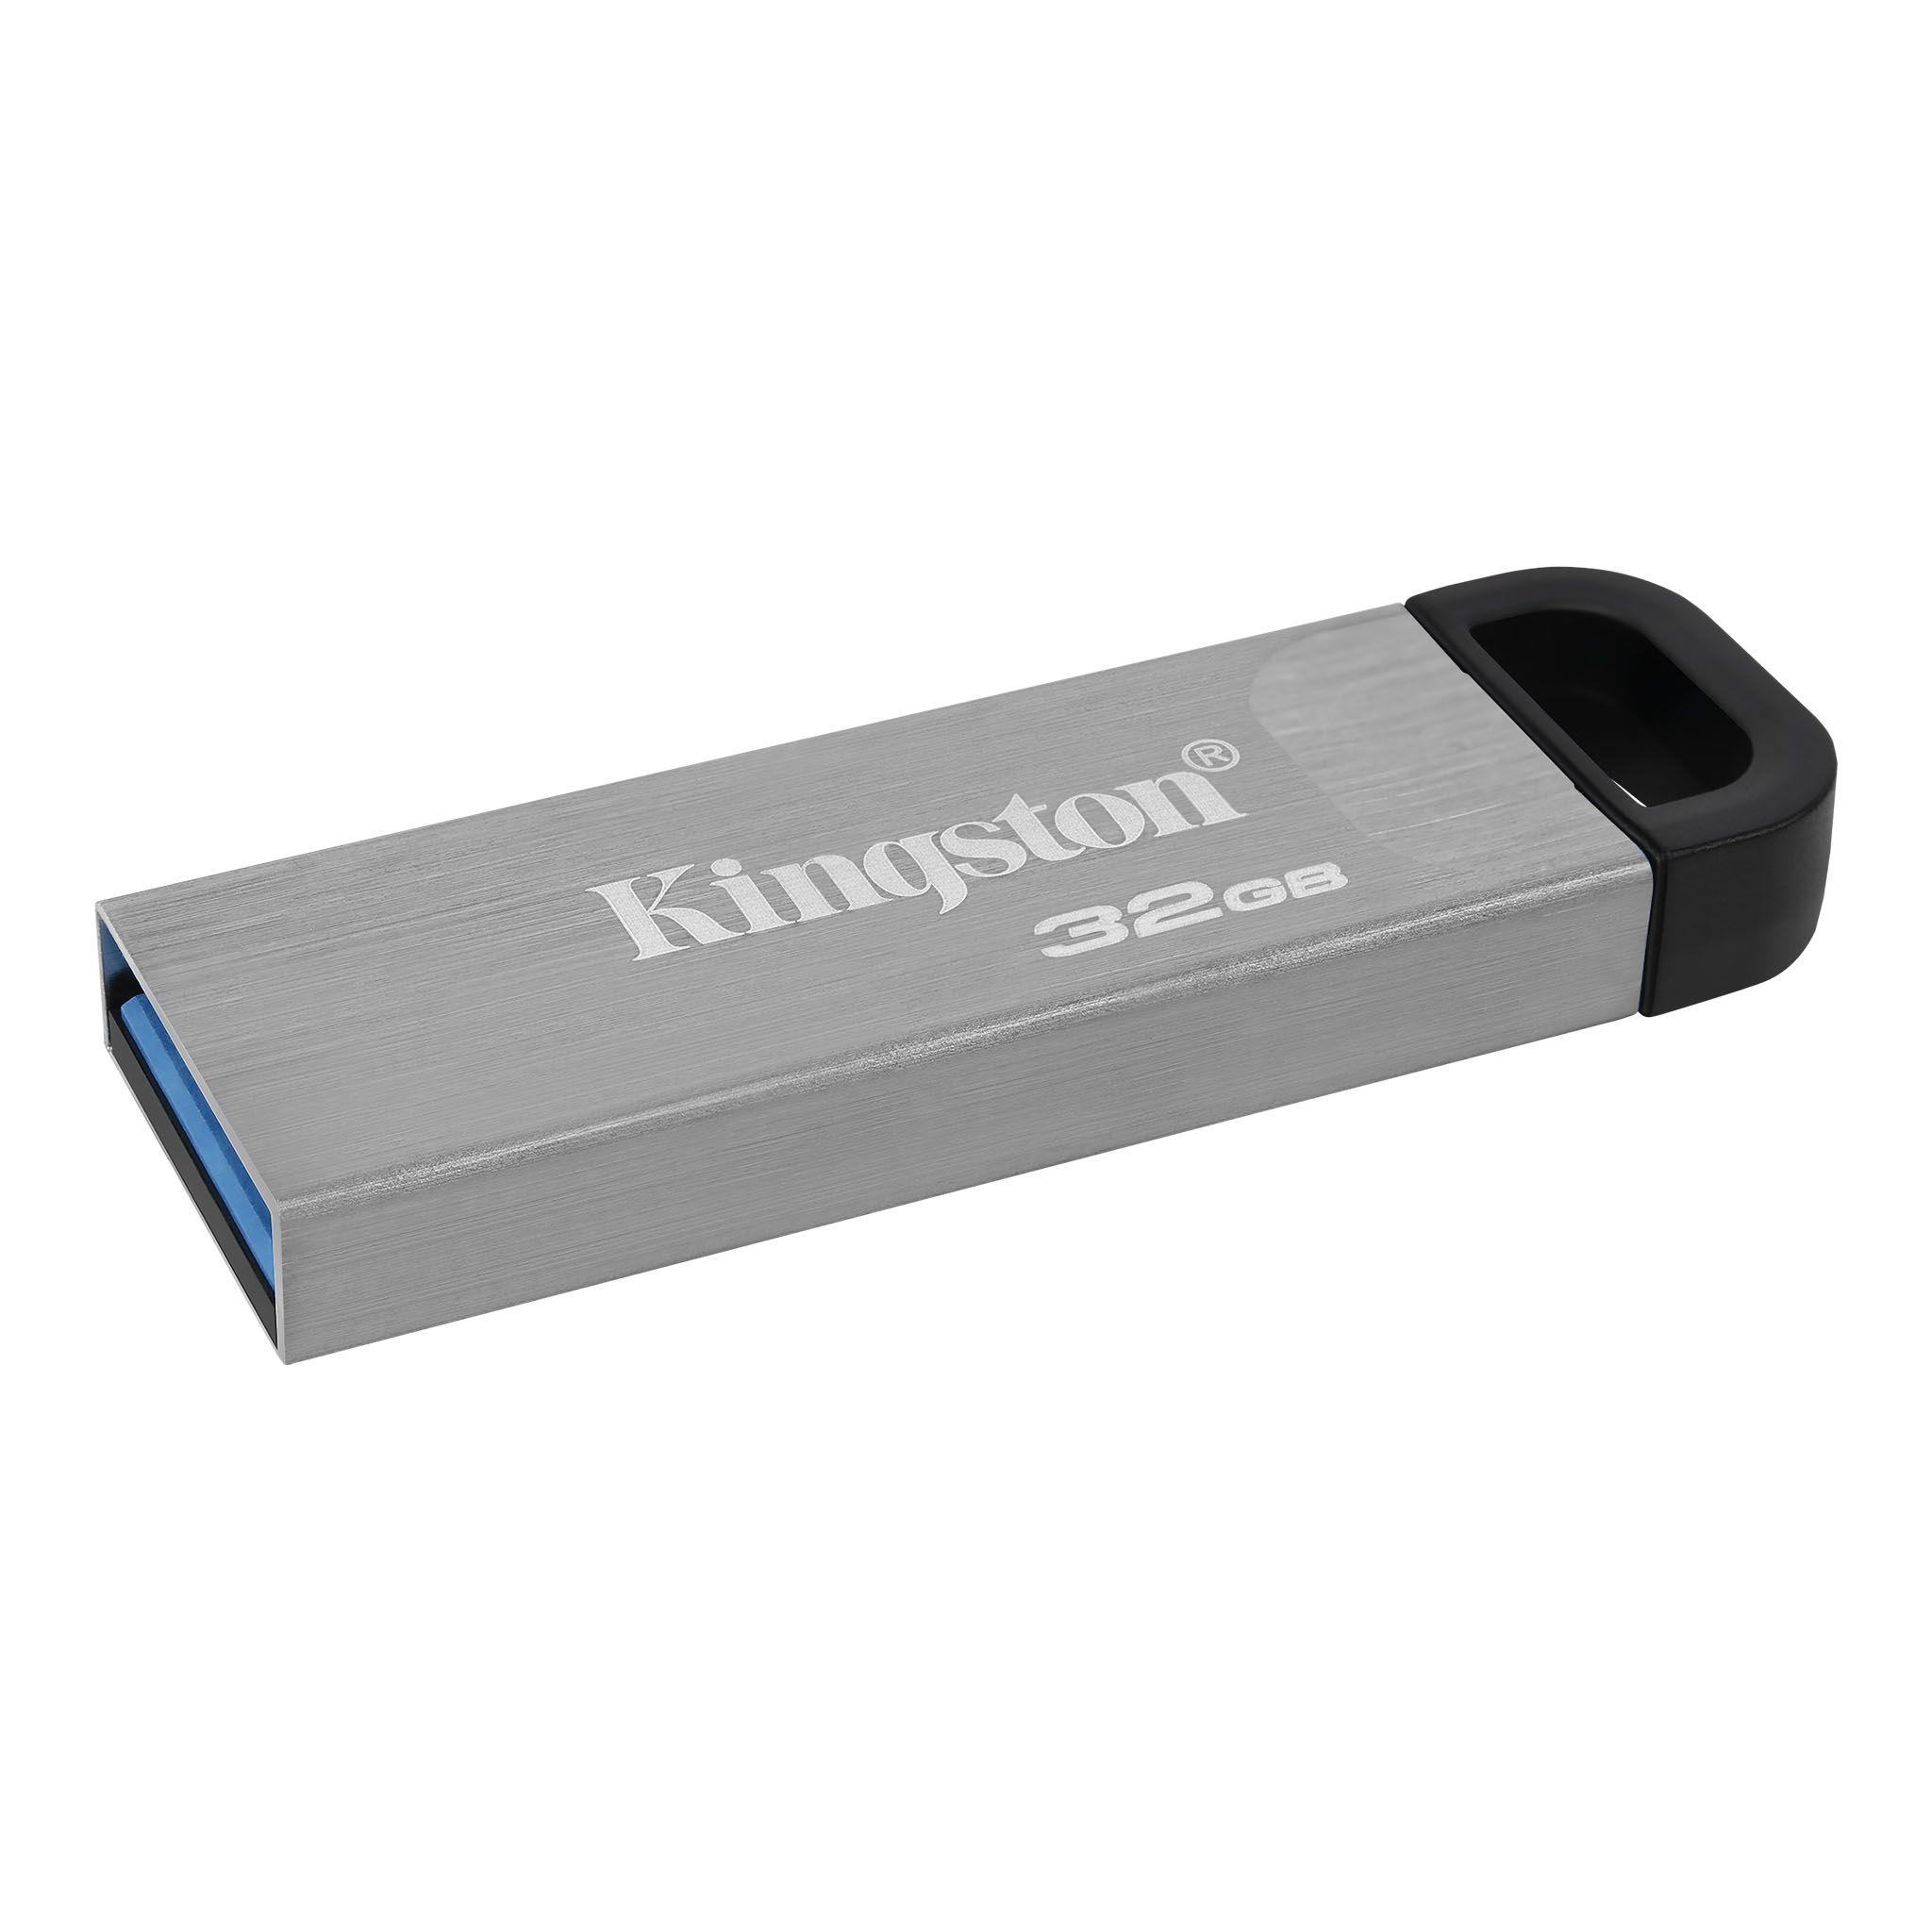 Kingston USB 3.0 Flash Drive 64 GB with Stylish Capless Metal Case DTKN/64G